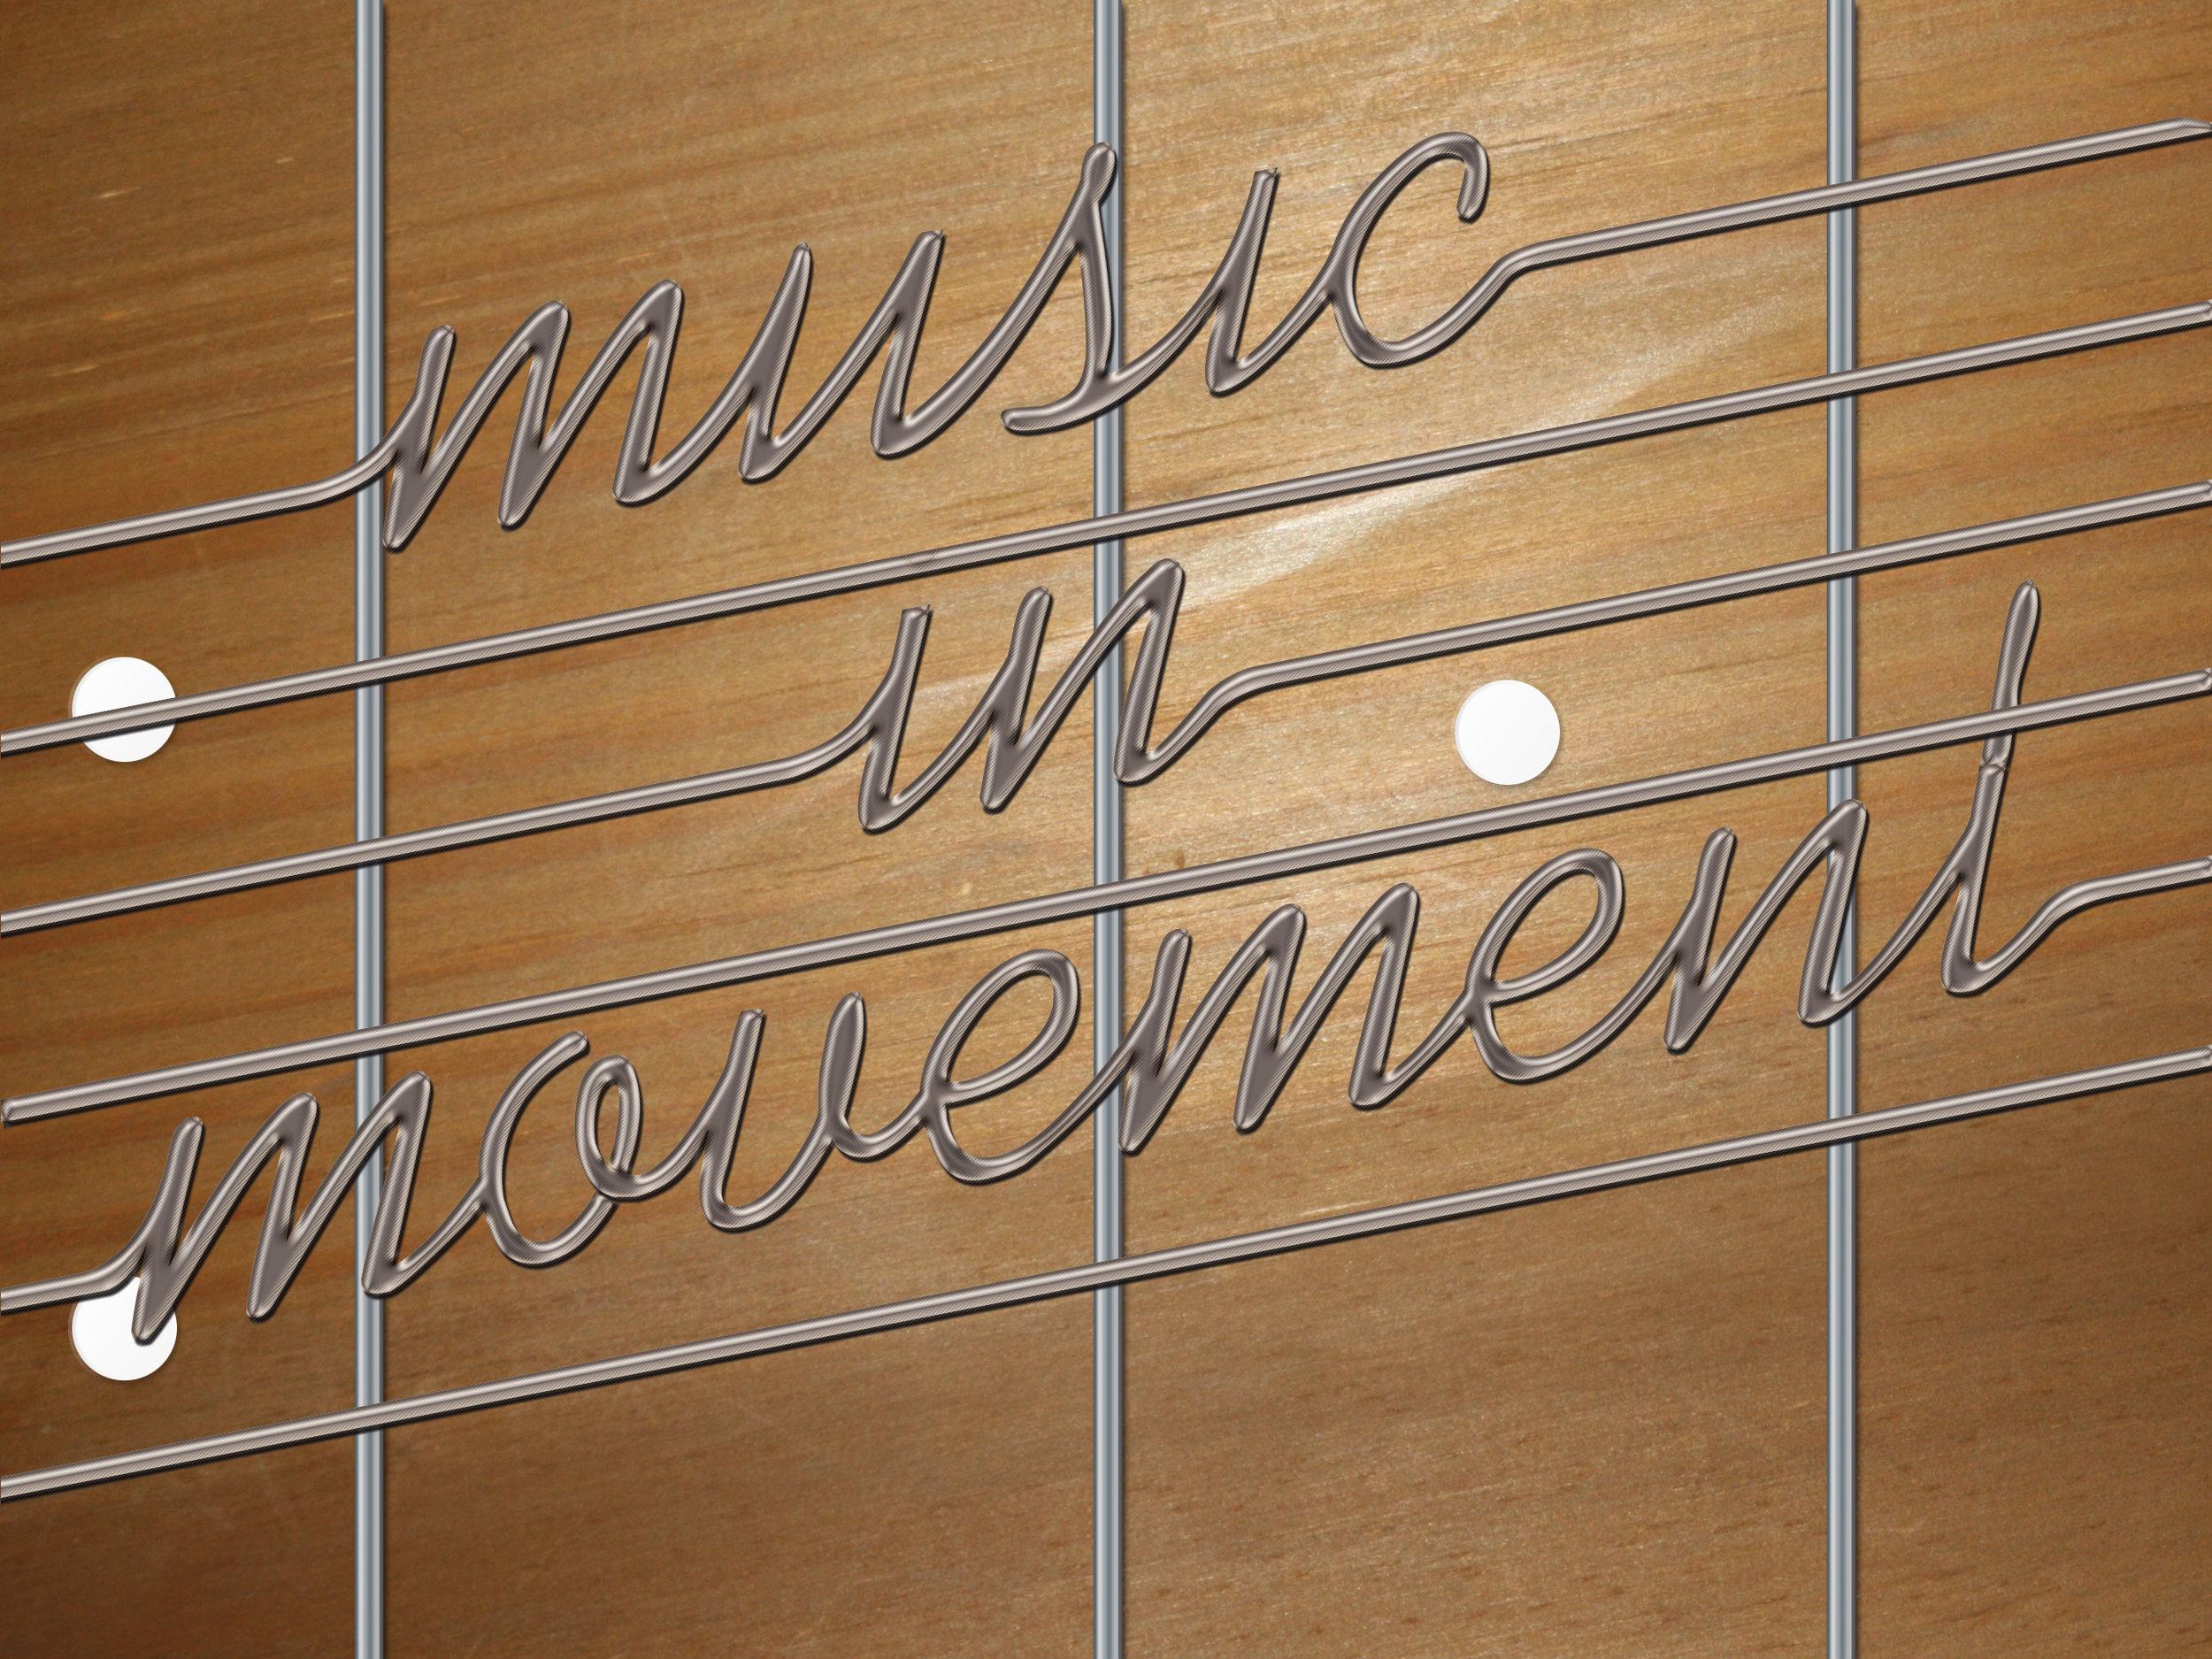 musicinmovement_assets-05.jpg